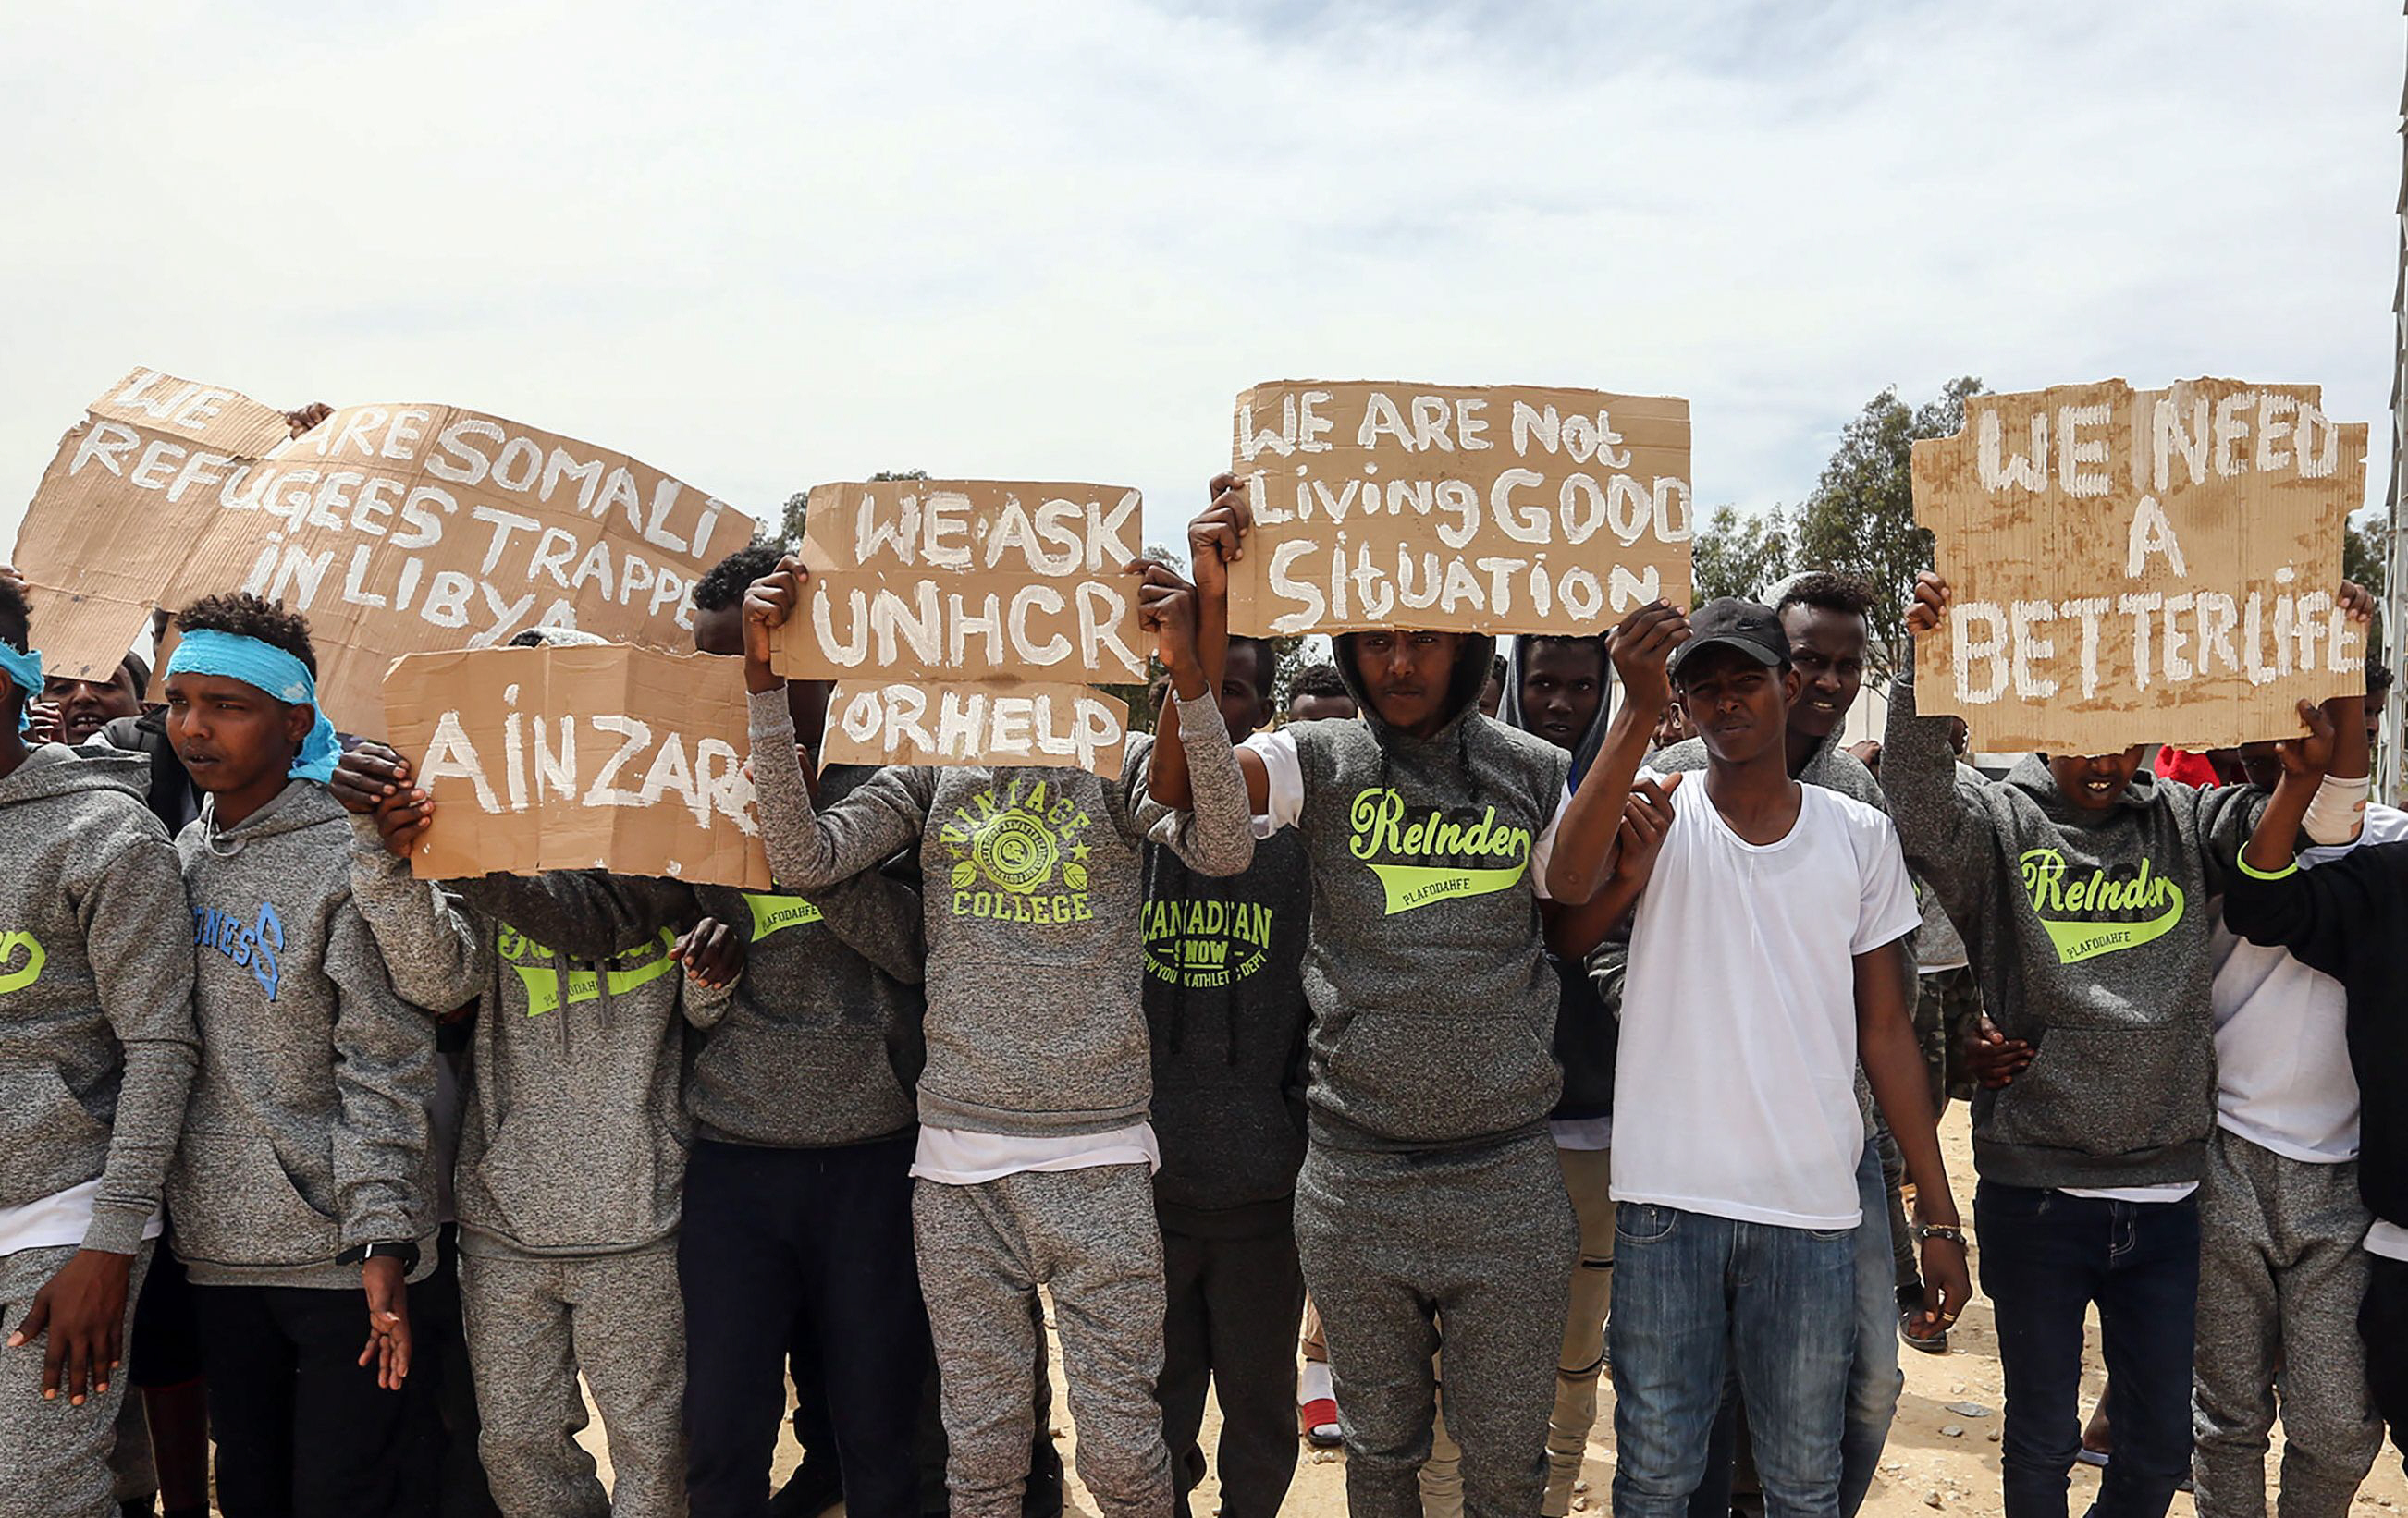 libya in chaos since 2011 overthrow of gaddafi